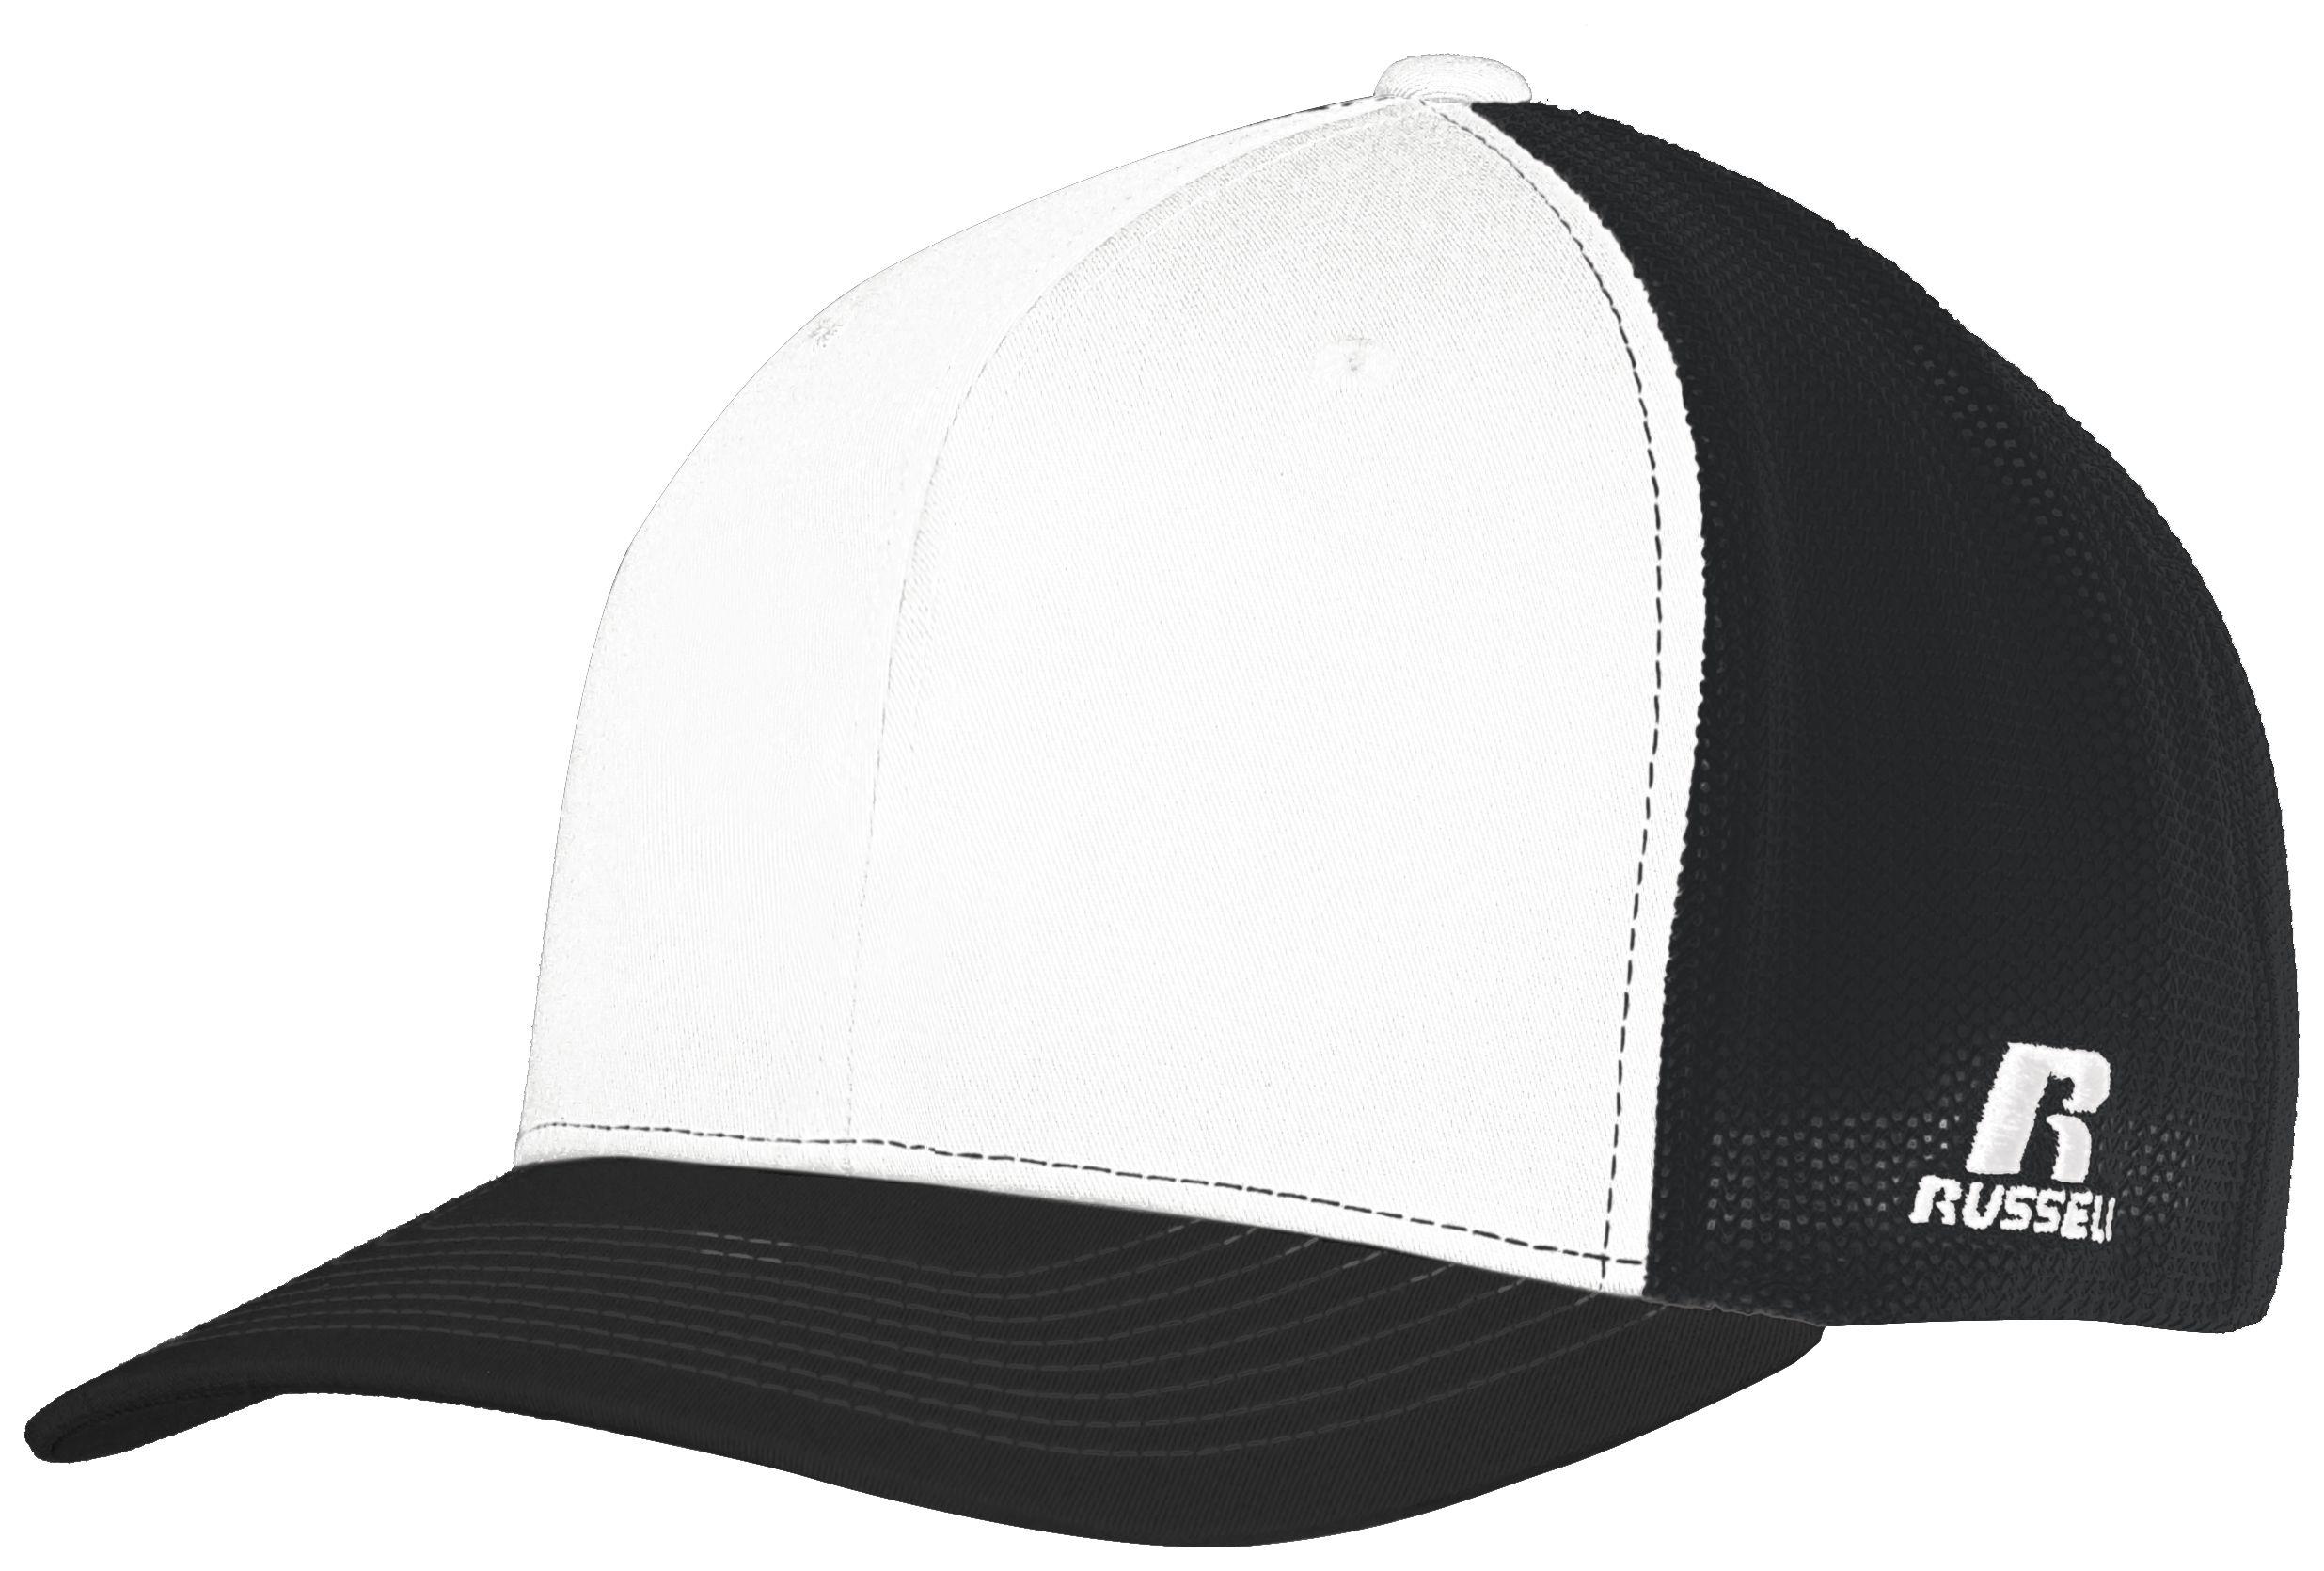 Youth Flexfit Twill Mesh Cap - WHITE/BLACK